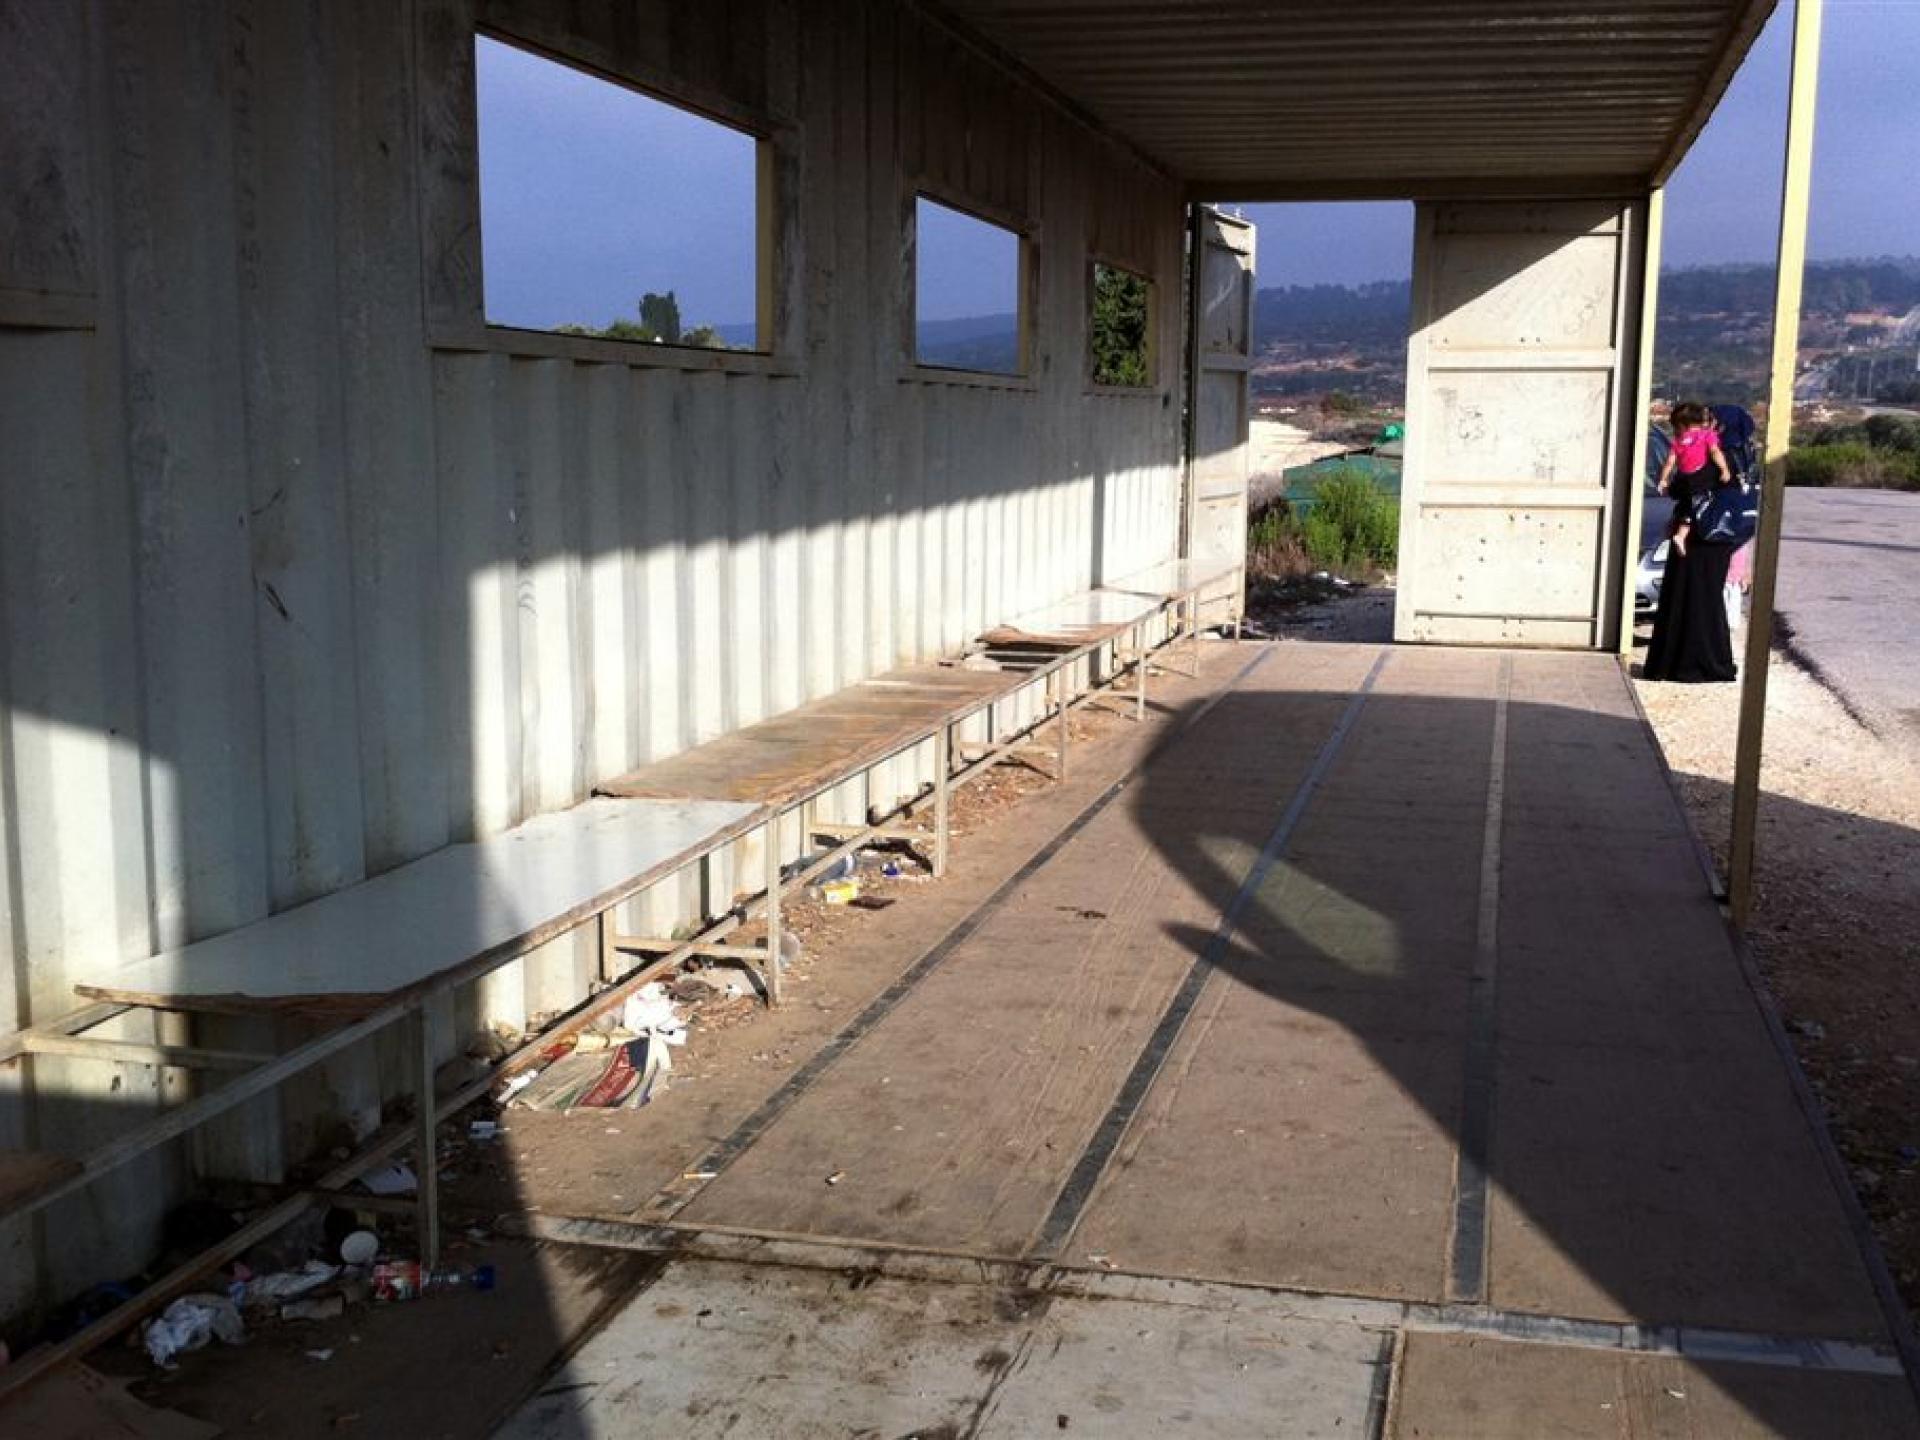 24.08.14 Tura/shaked Checkpoint מחסום טורה-שקד